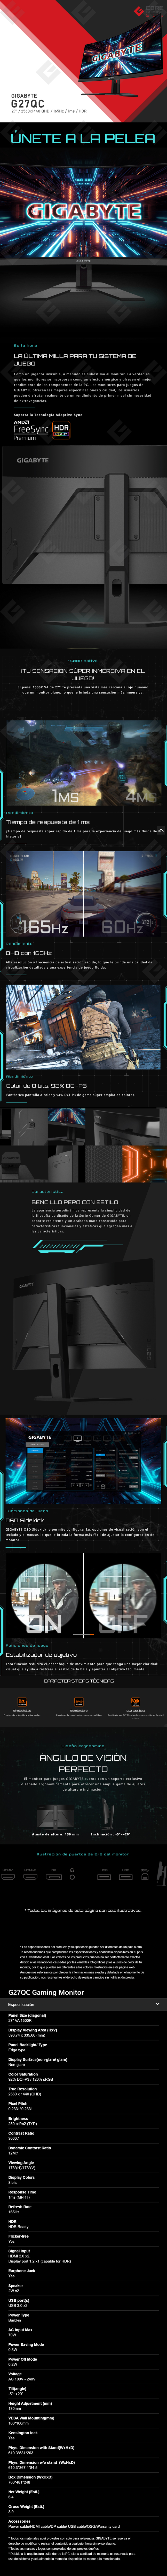 "Monitor Gigabyte G27QC 27"" Curvo, 2560 x 1440 QHD, HDR, 1MS, 165Hz, VA, HDMI, Displayport, Bocinas, AMD Freesync"